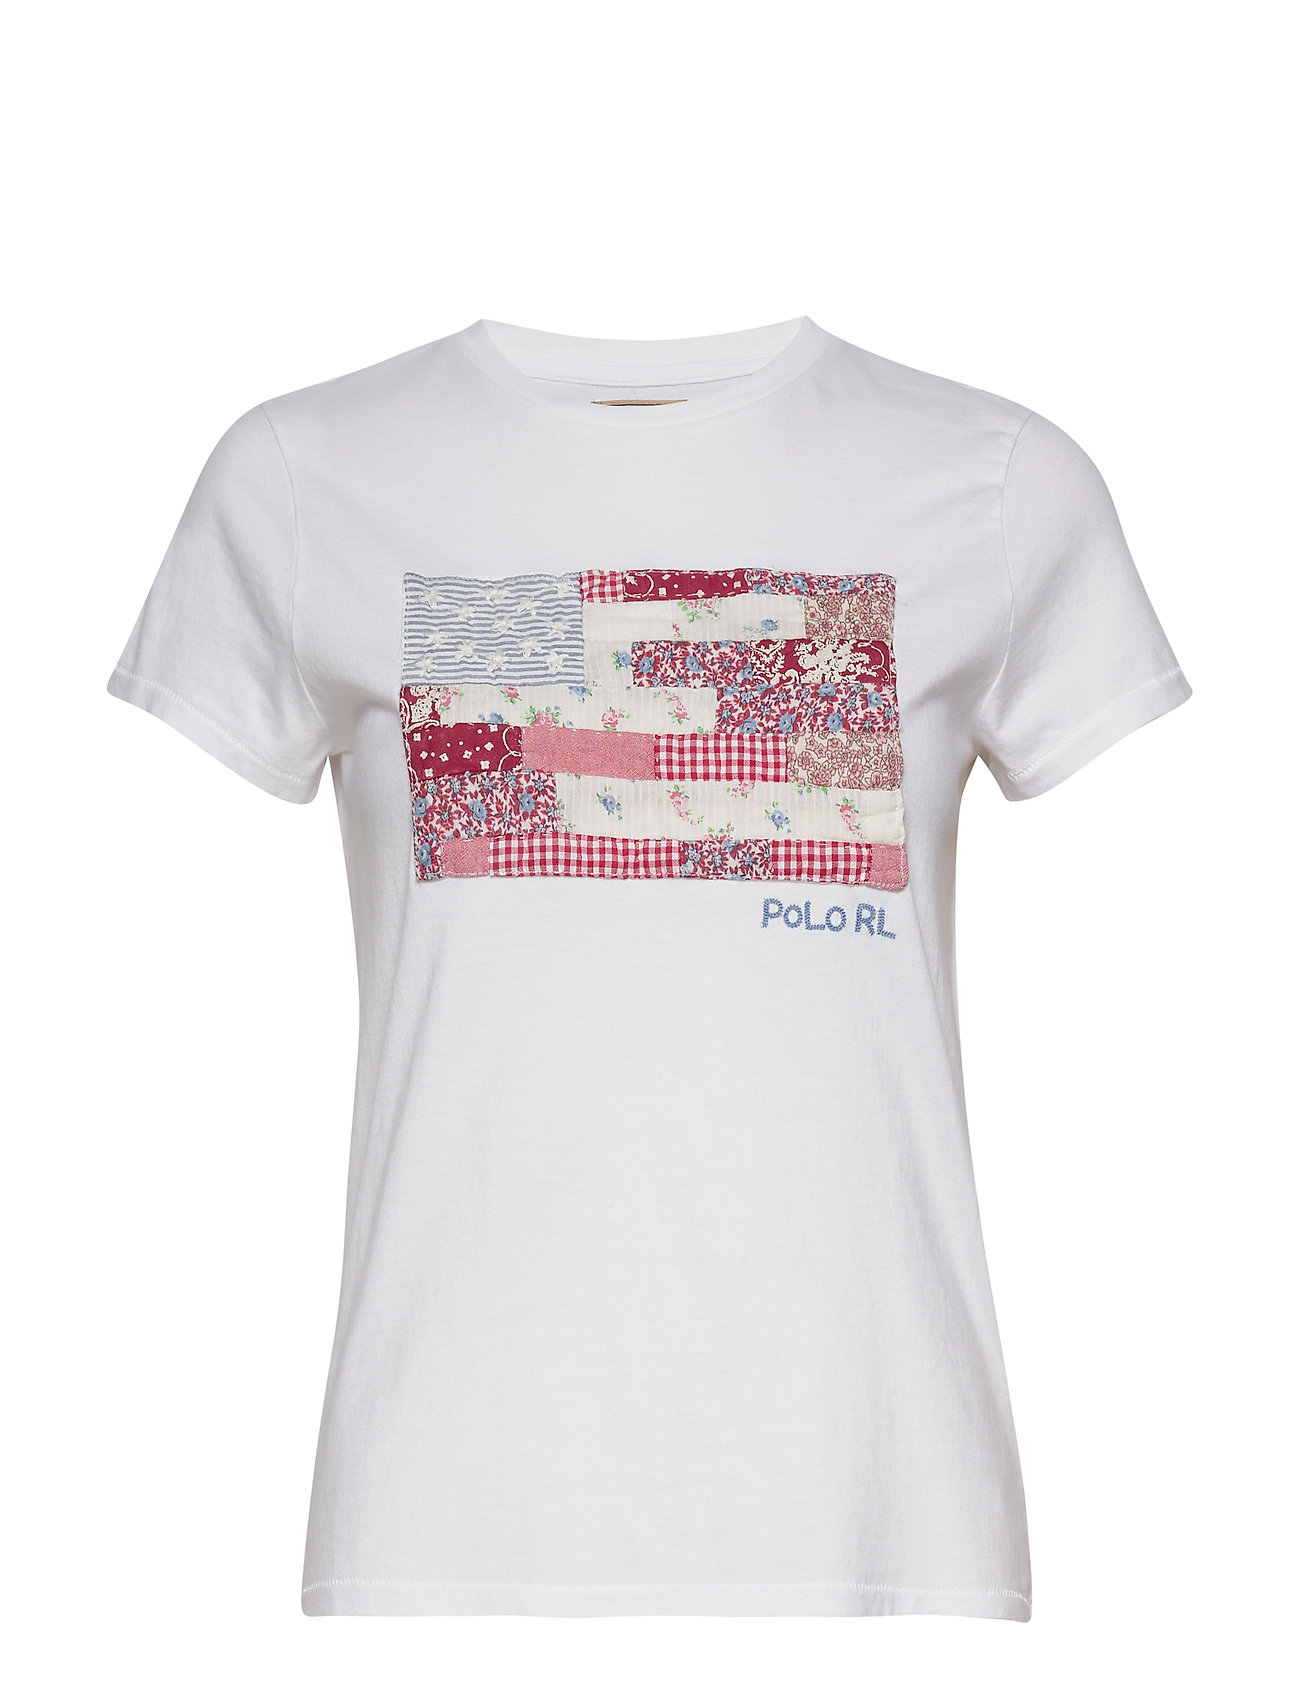 Polo Ralph Lauren Patchwork Flag Cotton Tee - WHITE